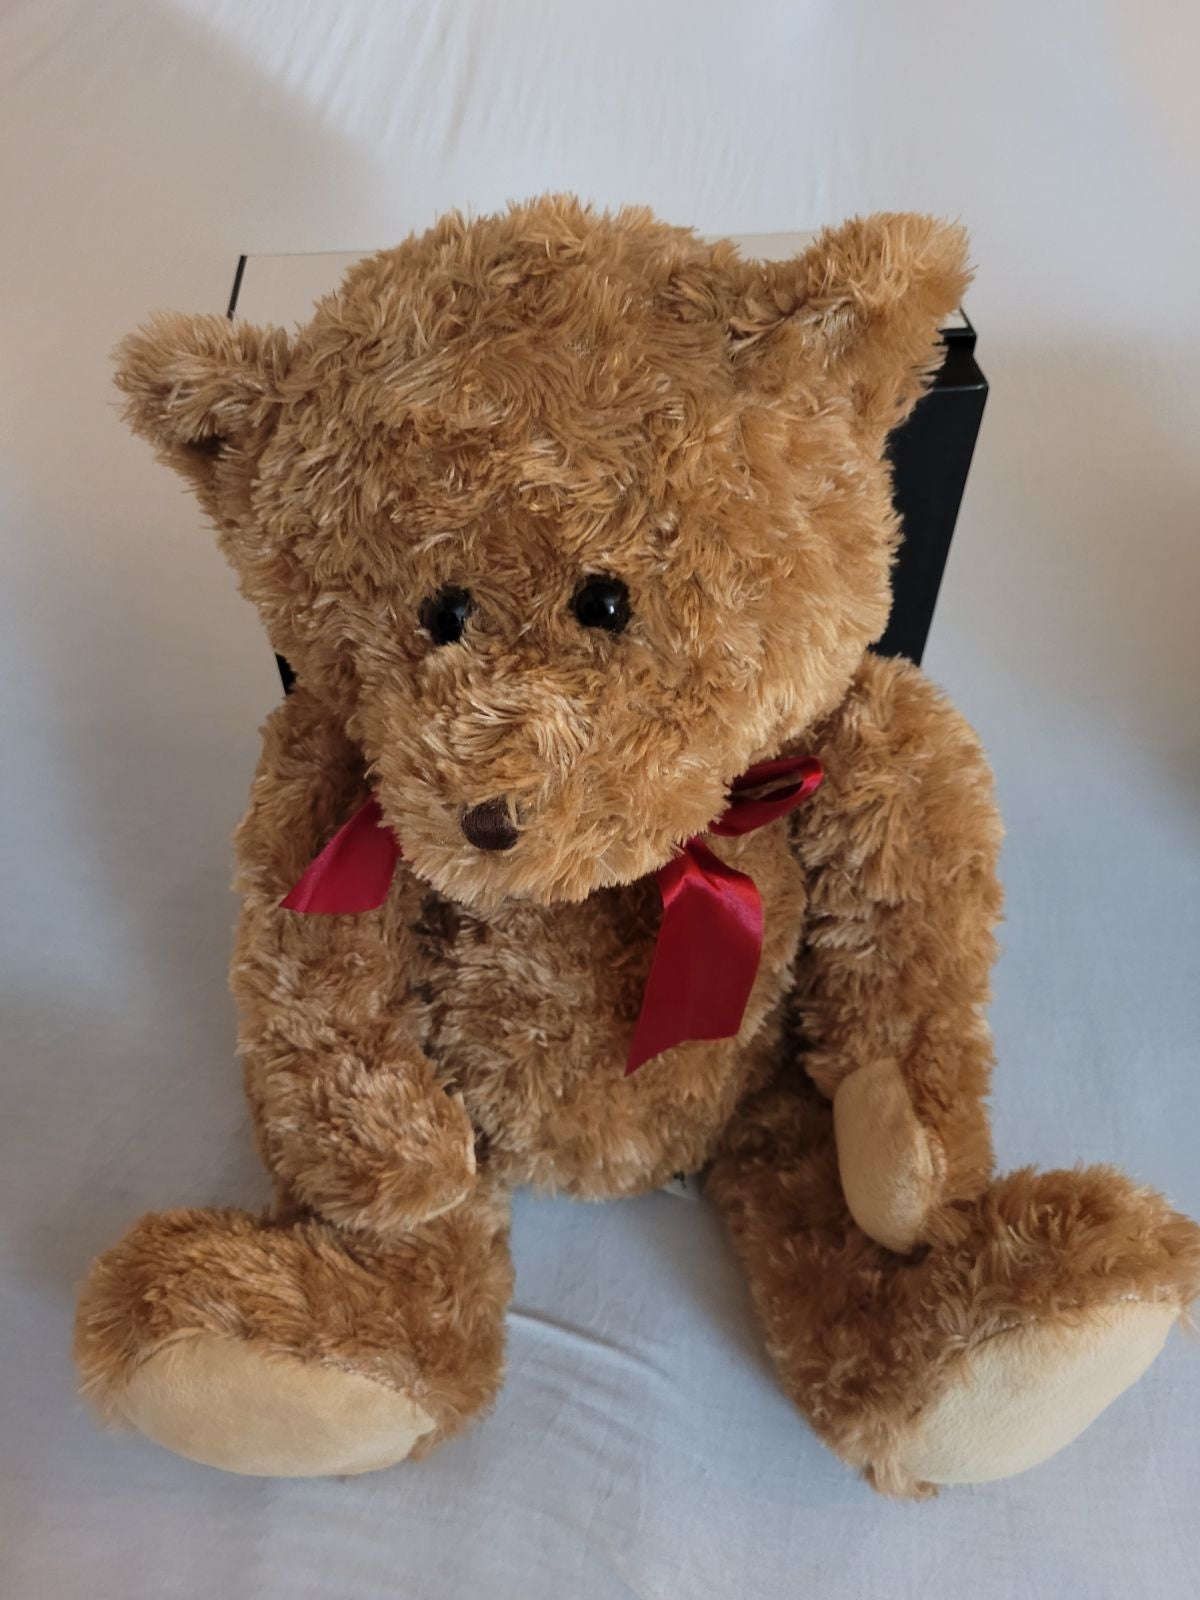 Soft and fluffy Teddy bear